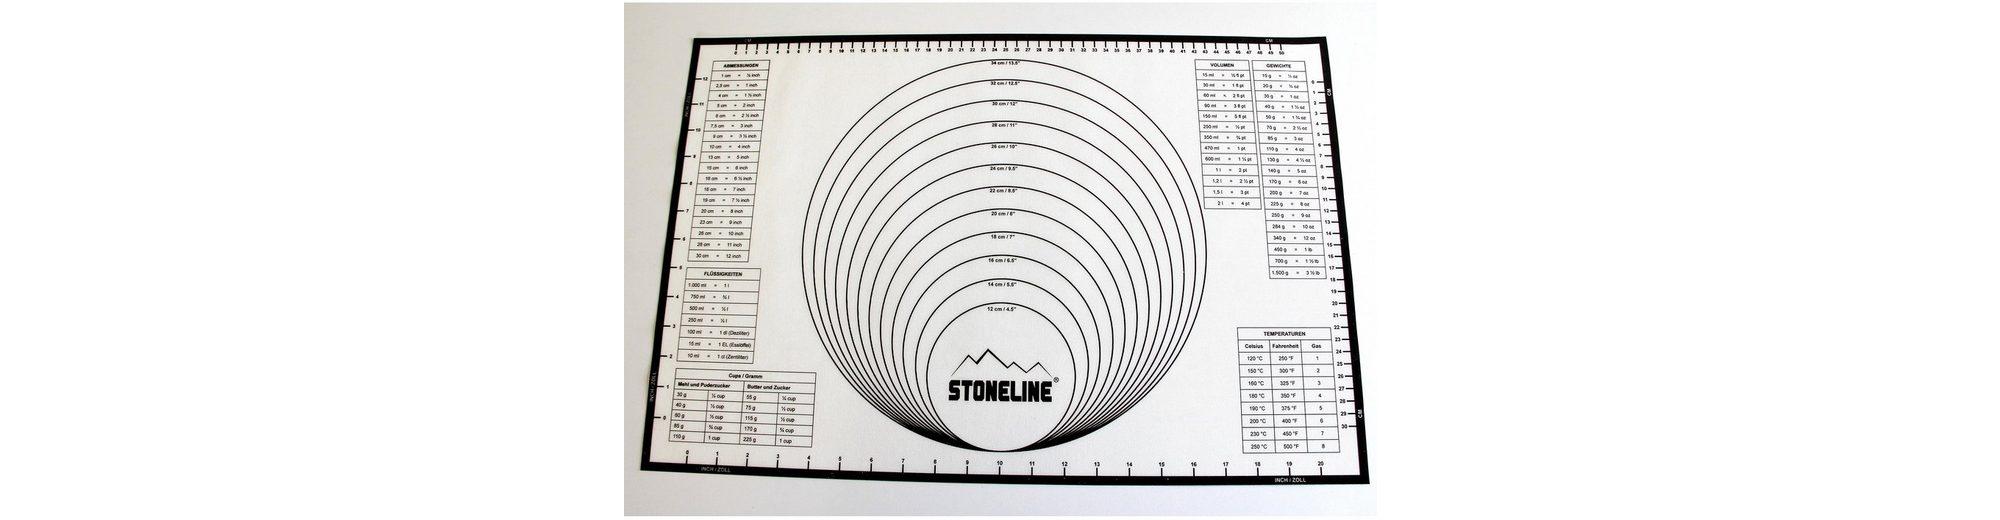 Silikon-Backmatte 2in1, STONELINE®